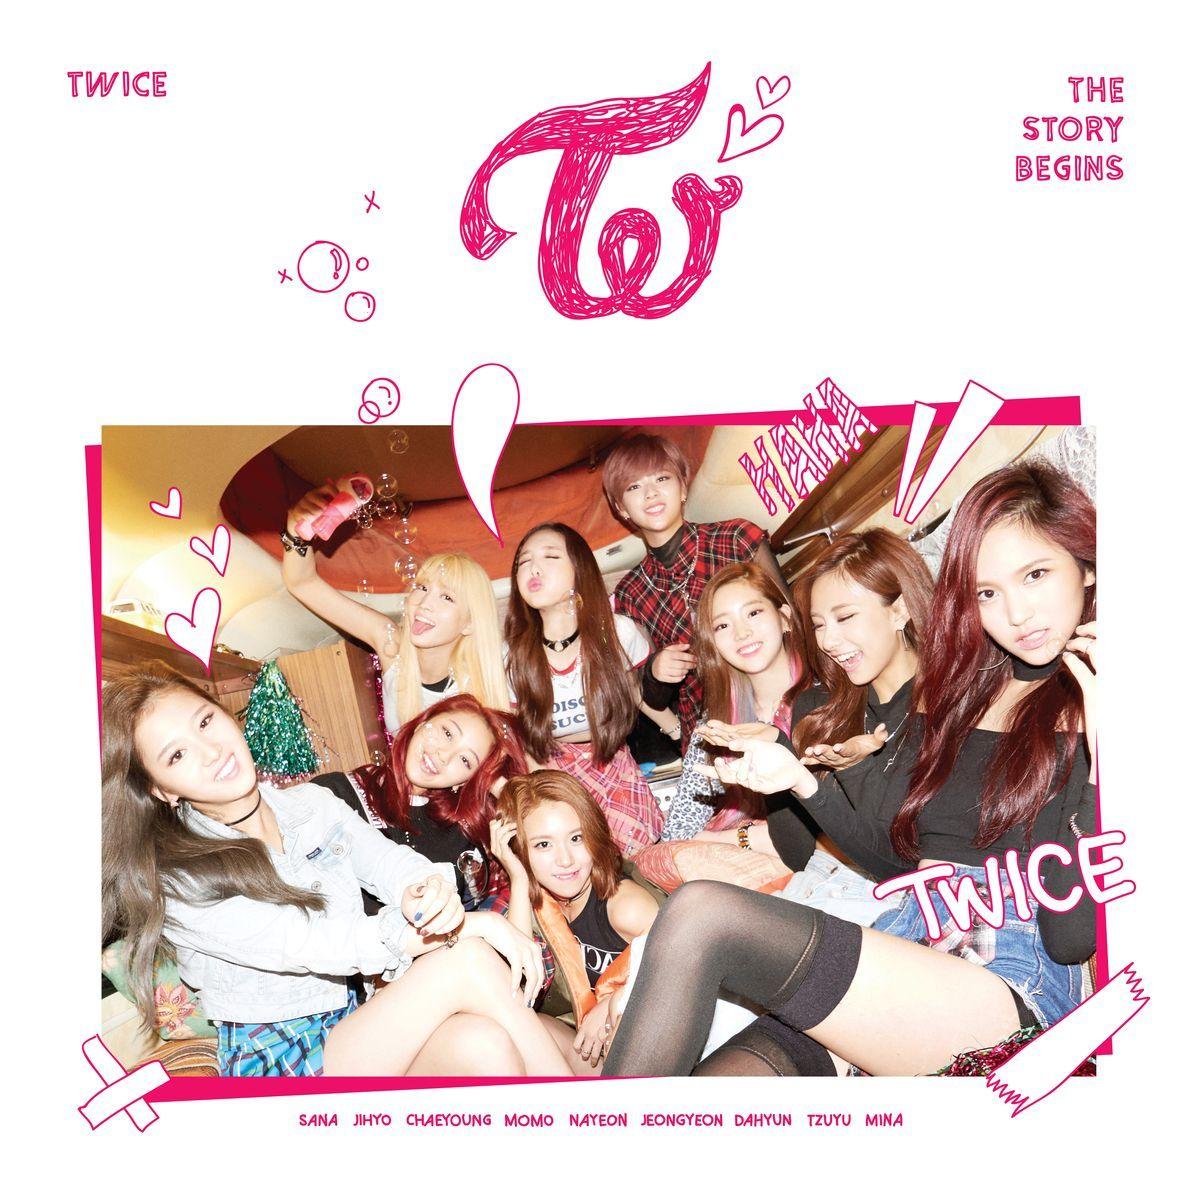 1st Mini Album 'The Story Begins'  #Twice #트와이스 #NaYeon #나연 #JungYeon #정연 #Momo #모모 #Sana #사나 #Jihyo #지효 #Mina #미나 #Dahyun #다현 #Chaeyoung #채영 #Tzuyu #쯔위 #PageTwo #PageTwoEra #TwicePageTwo #CheerUp #TwiceCheerUp